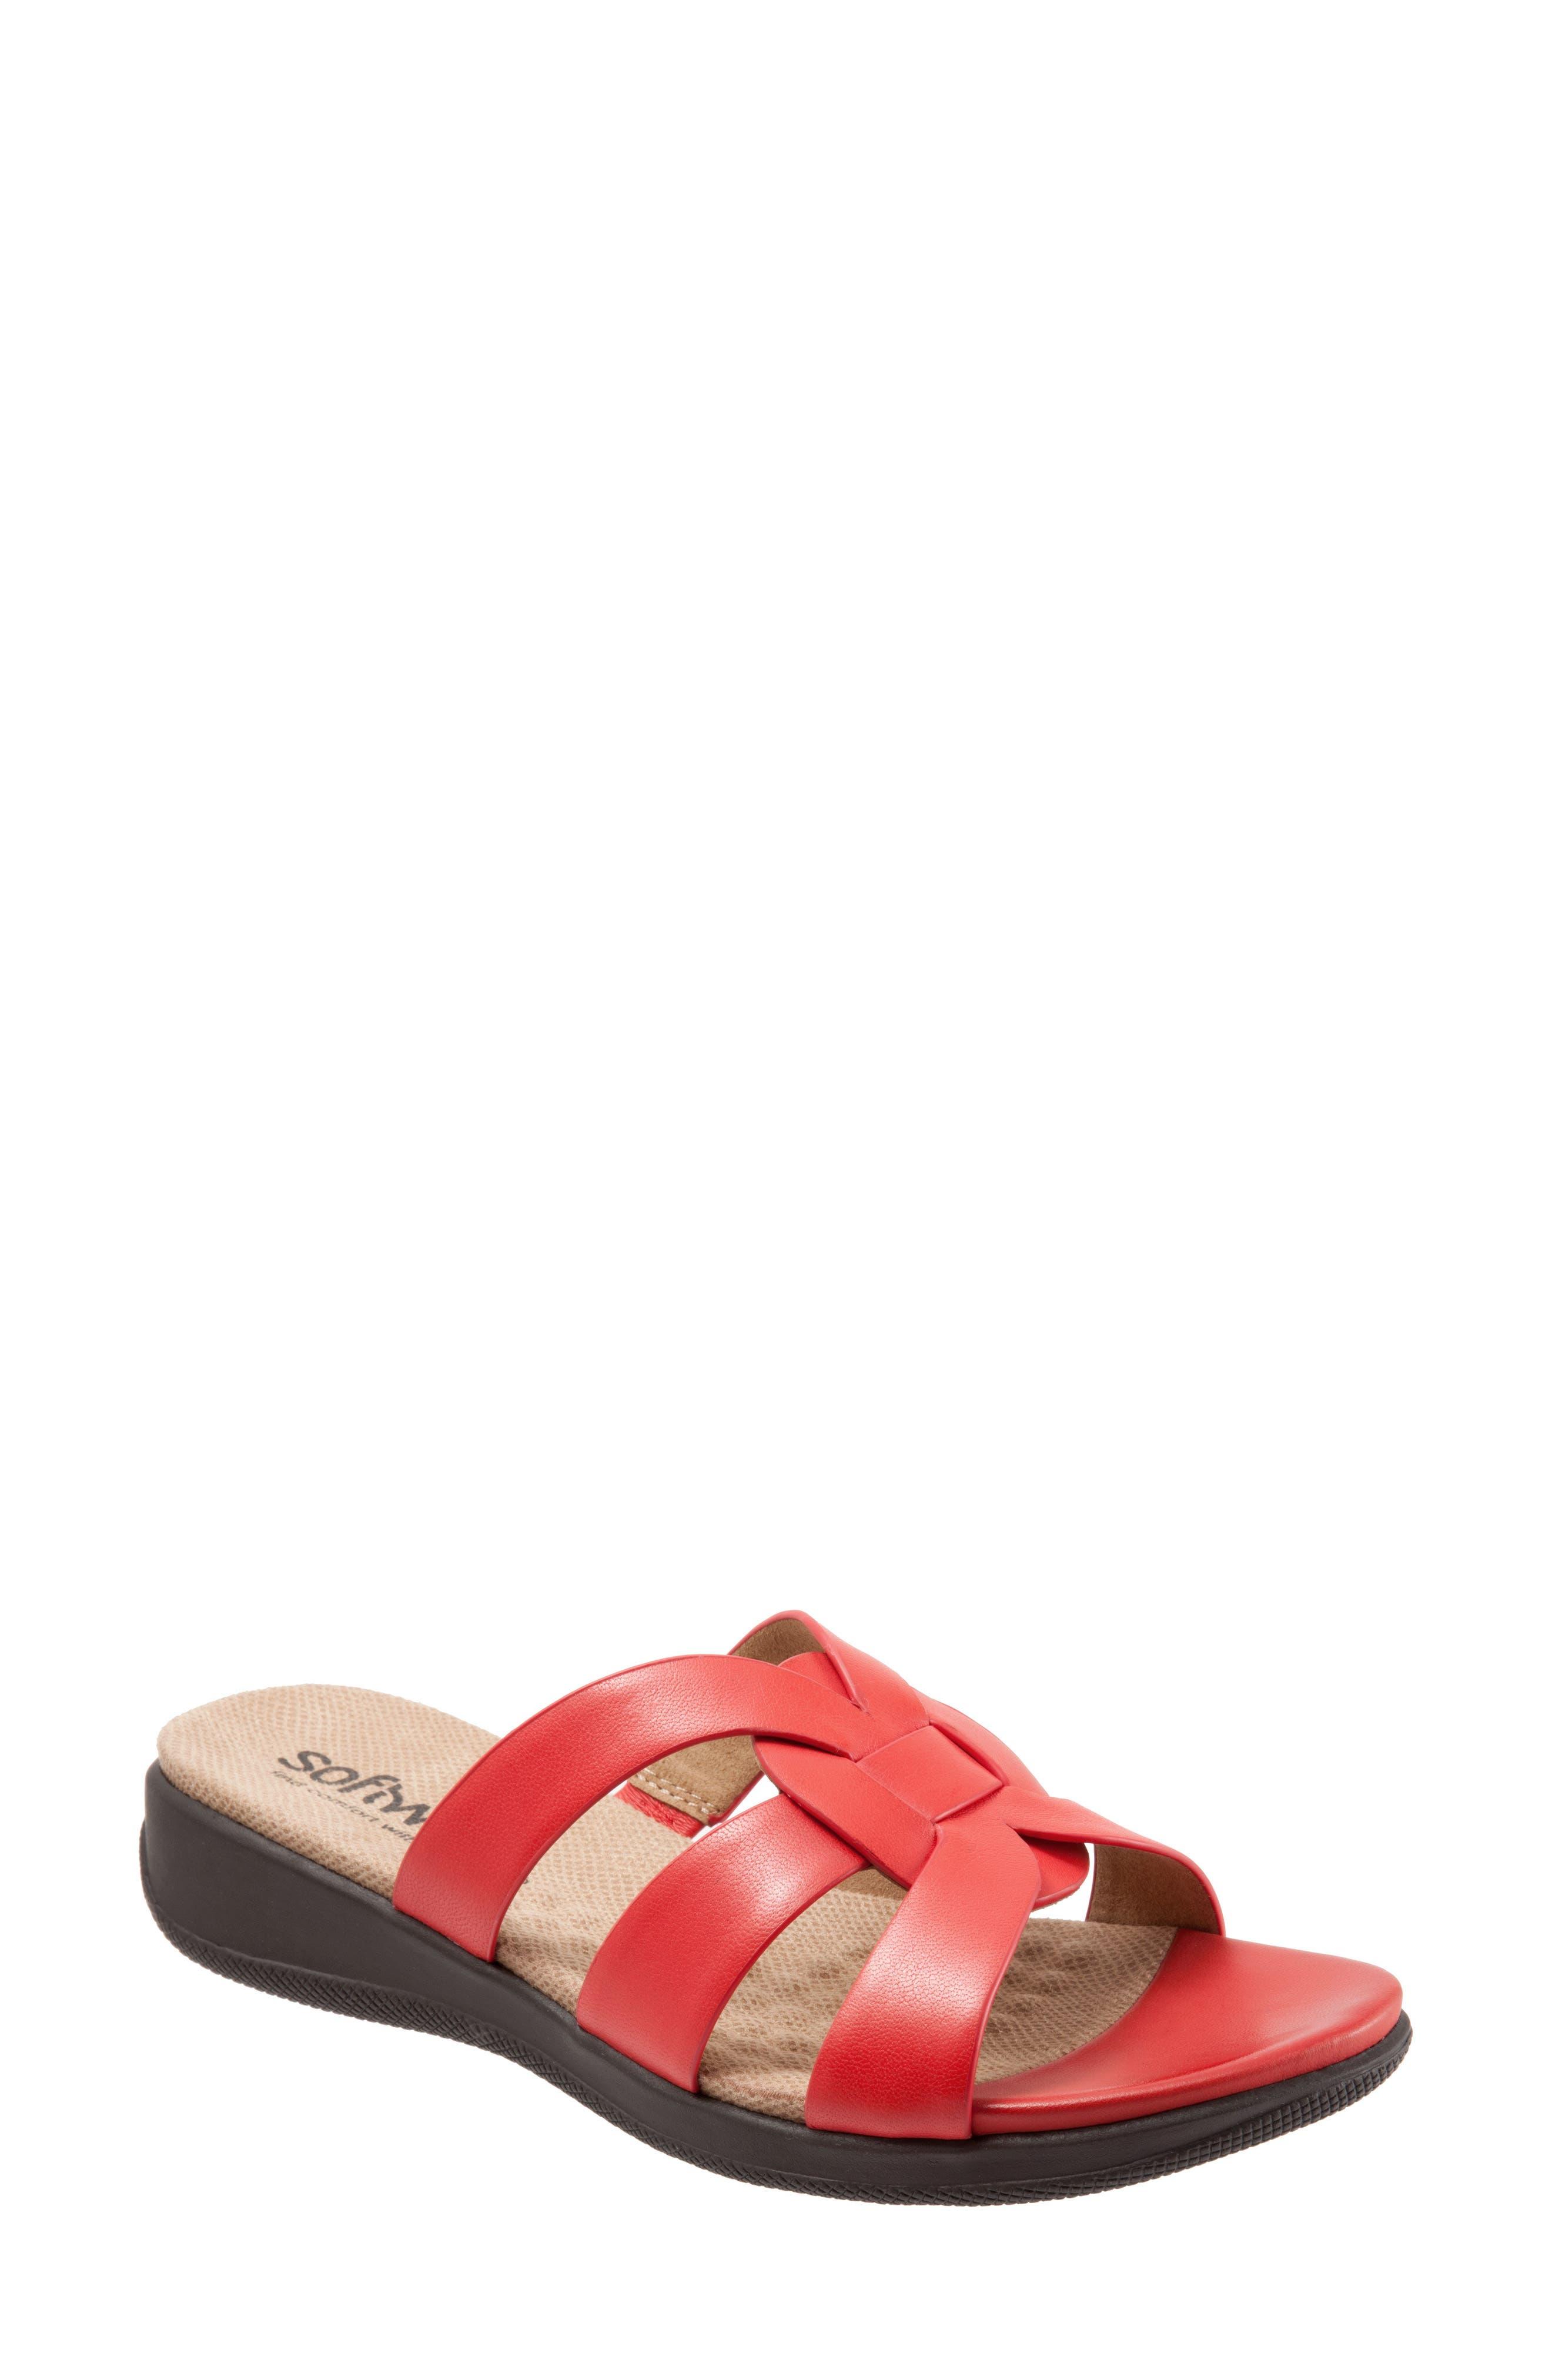 Thompson Slide Sandal,                             Main thumbnail 3, color,